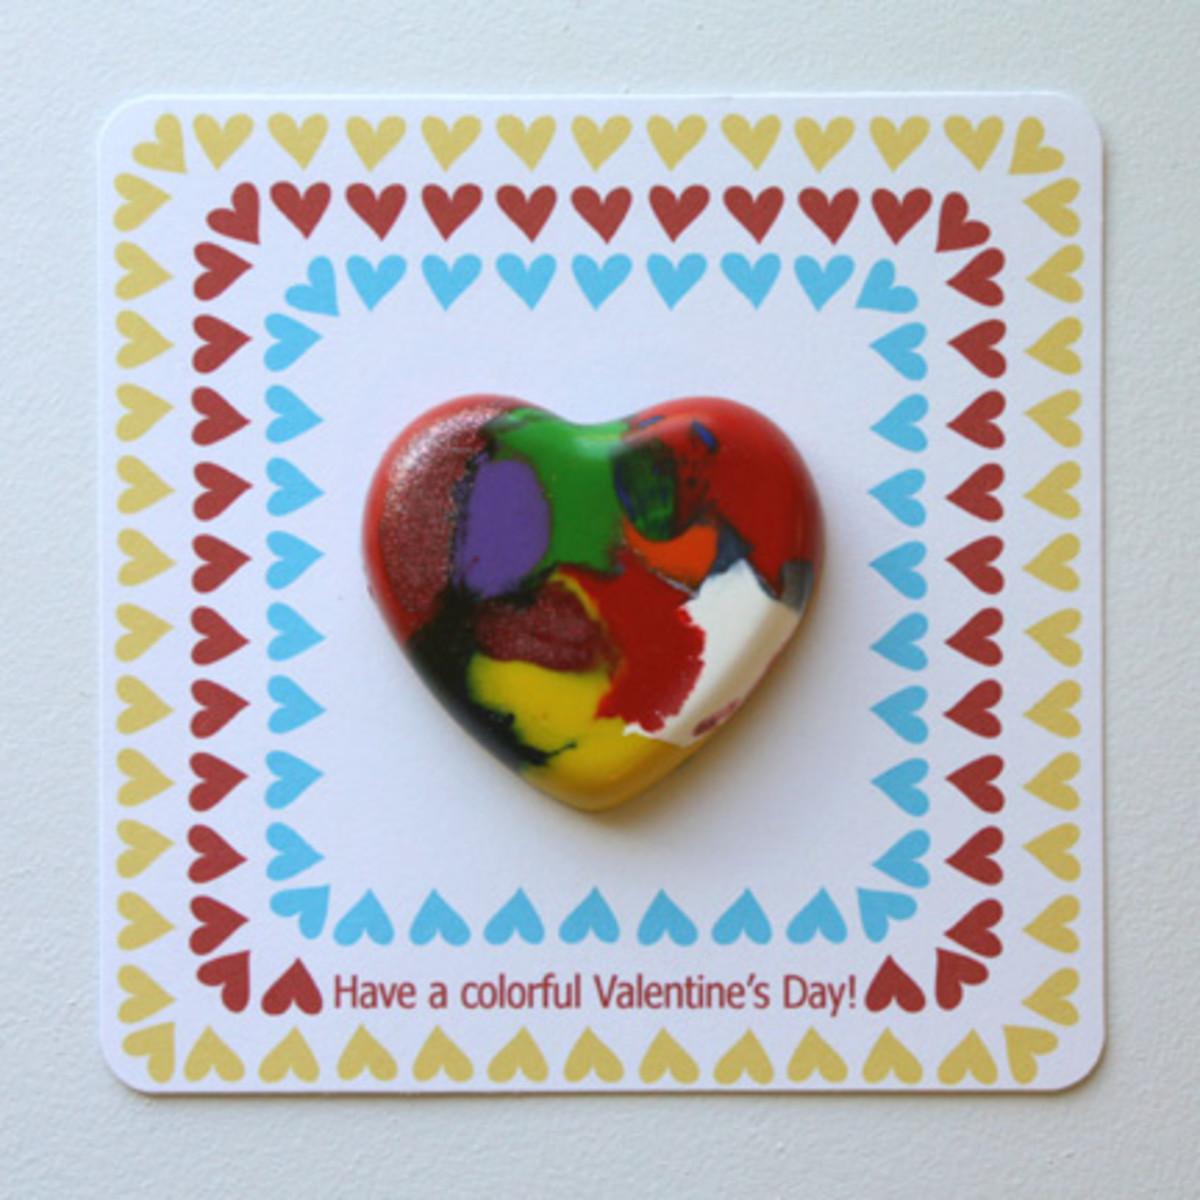 homemade crayon valentine's heart